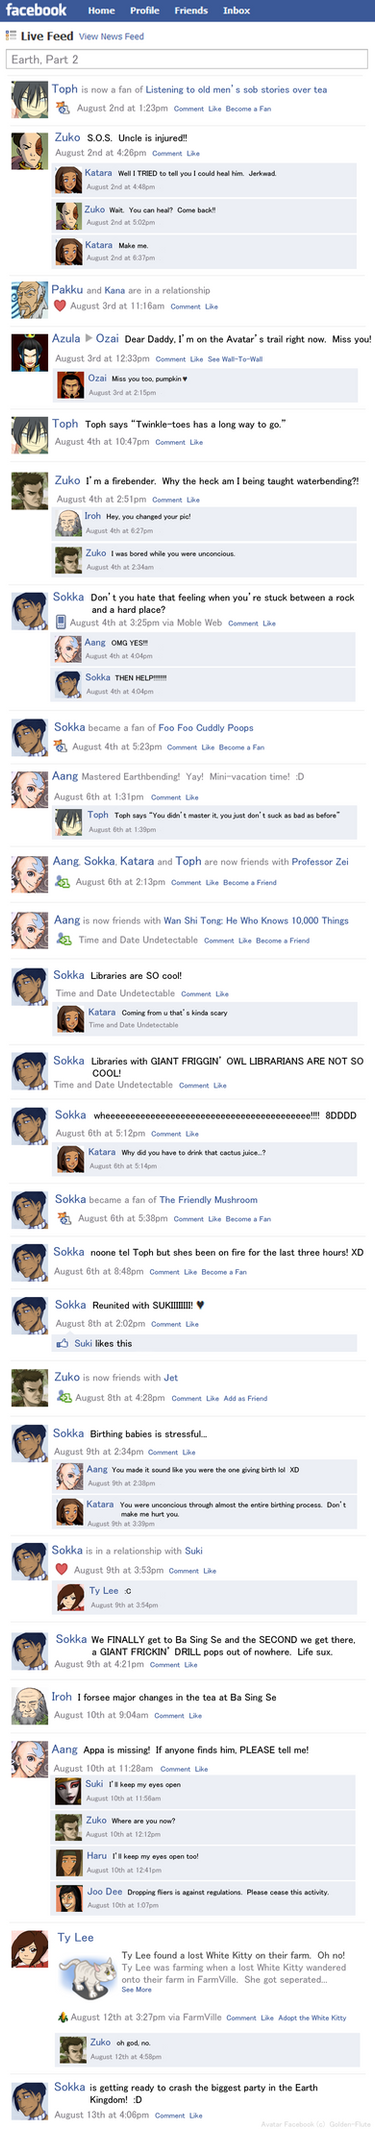 Avatar Facebook Earth Part 2 by Golden-Flute